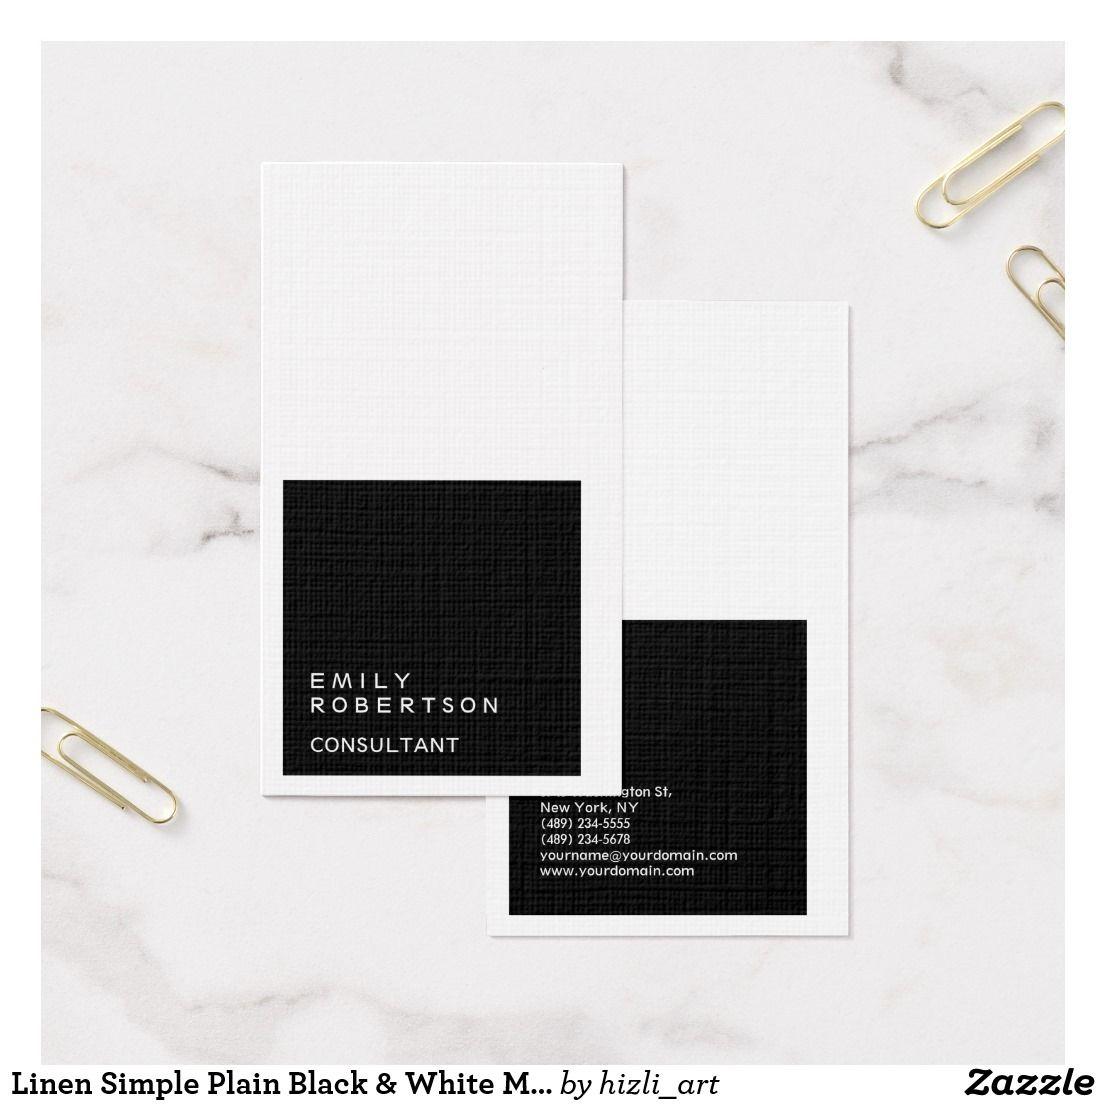 Linen Simple Plain Black & White Modern Minimalist Business Card ...